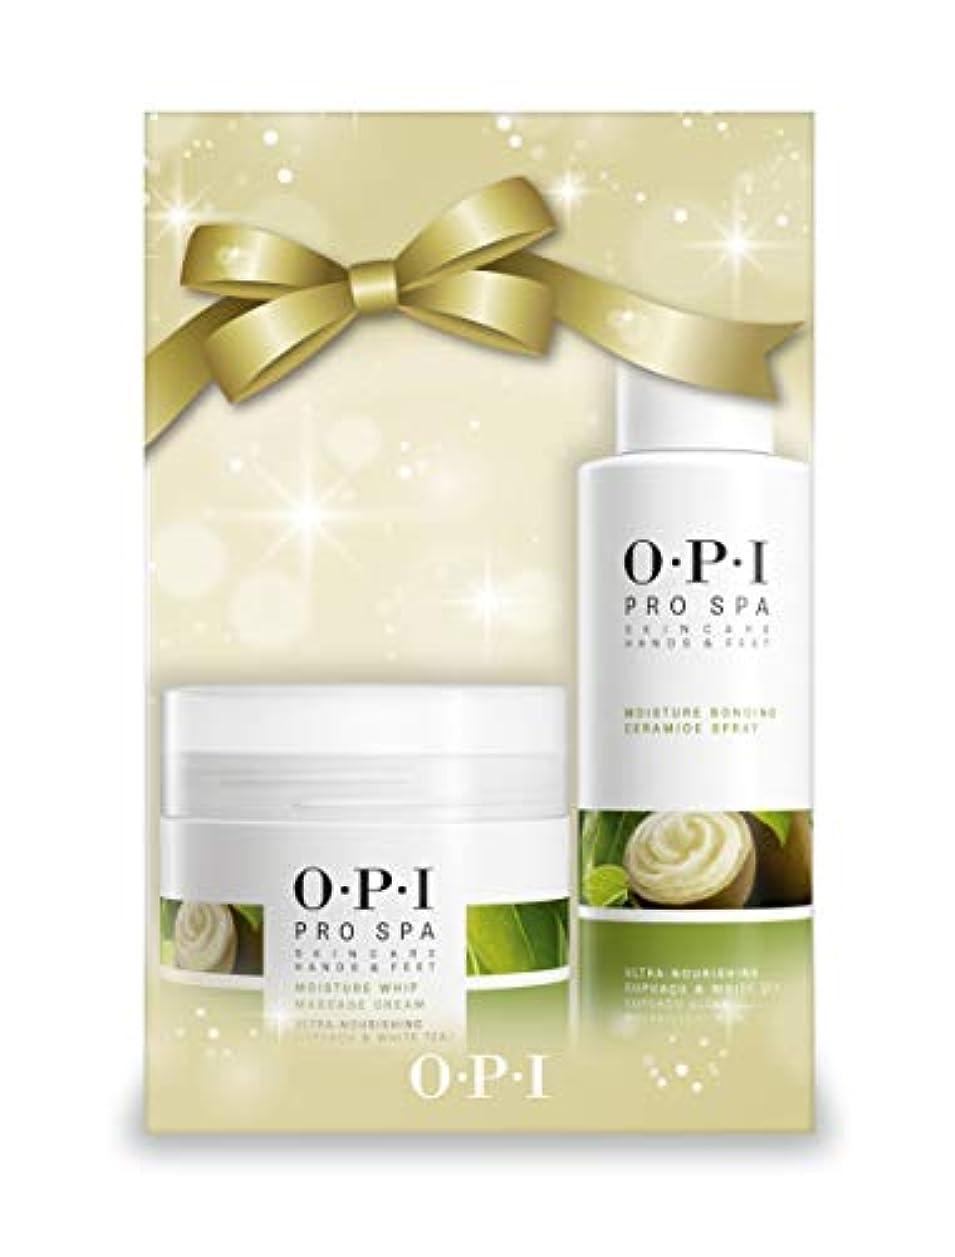 【Amazon.co.jp 限定】OPI(オーピーアイ) プロスパ ハンドフットケア&カラー セット【36%OFF】